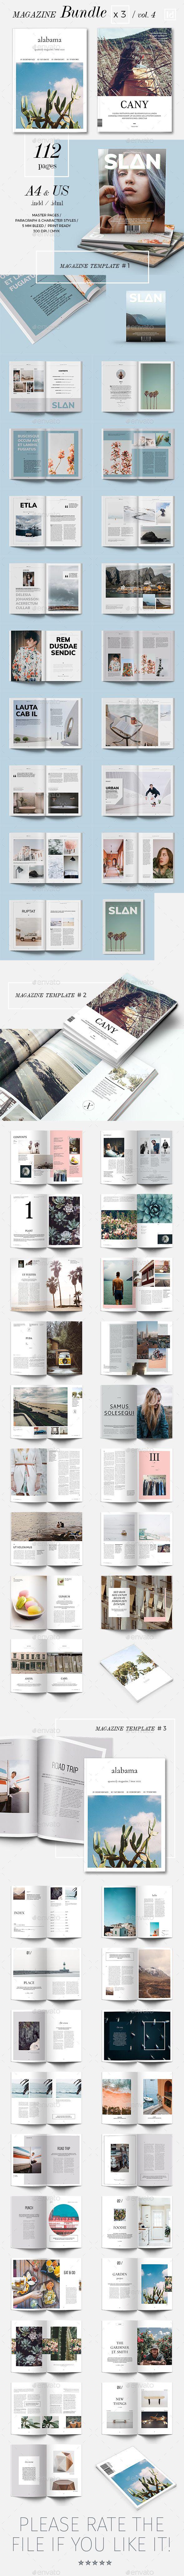 Magazine Template InDesign INDD Bundle